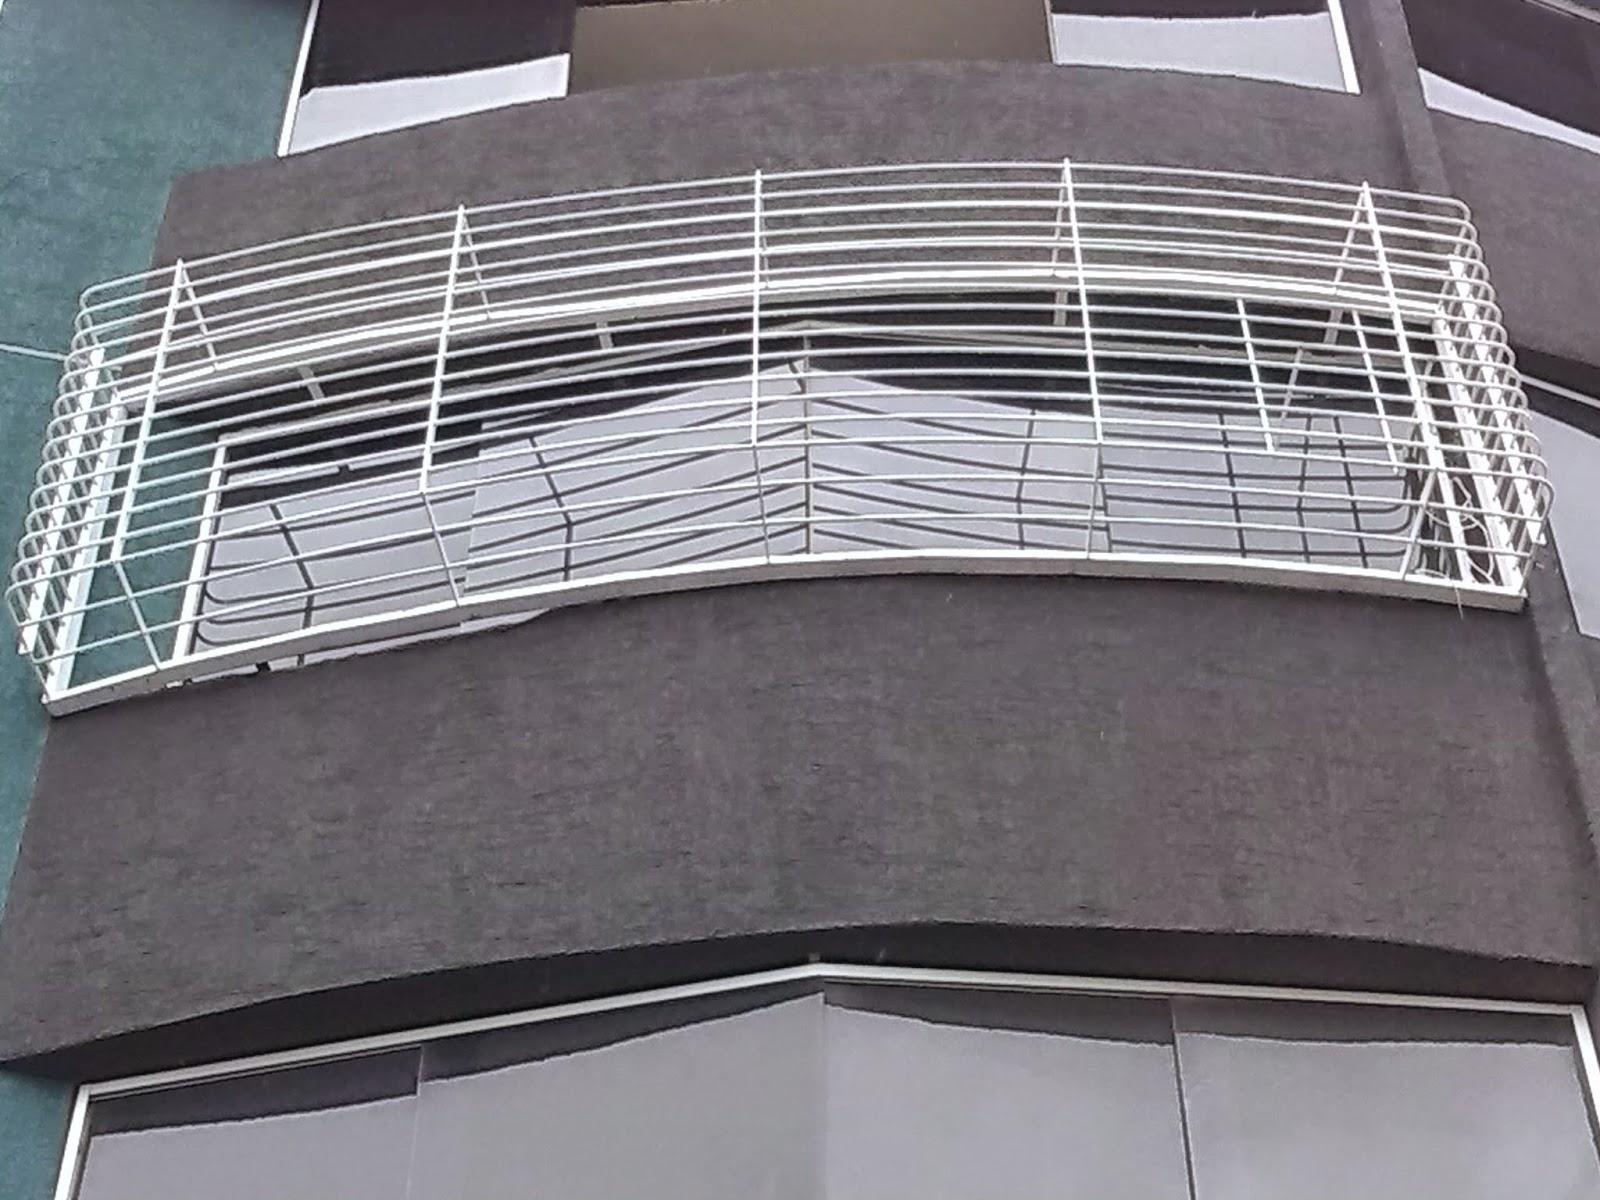 Aluminios ele ogu och c a rejas para balcones - Rejas para balcones ...